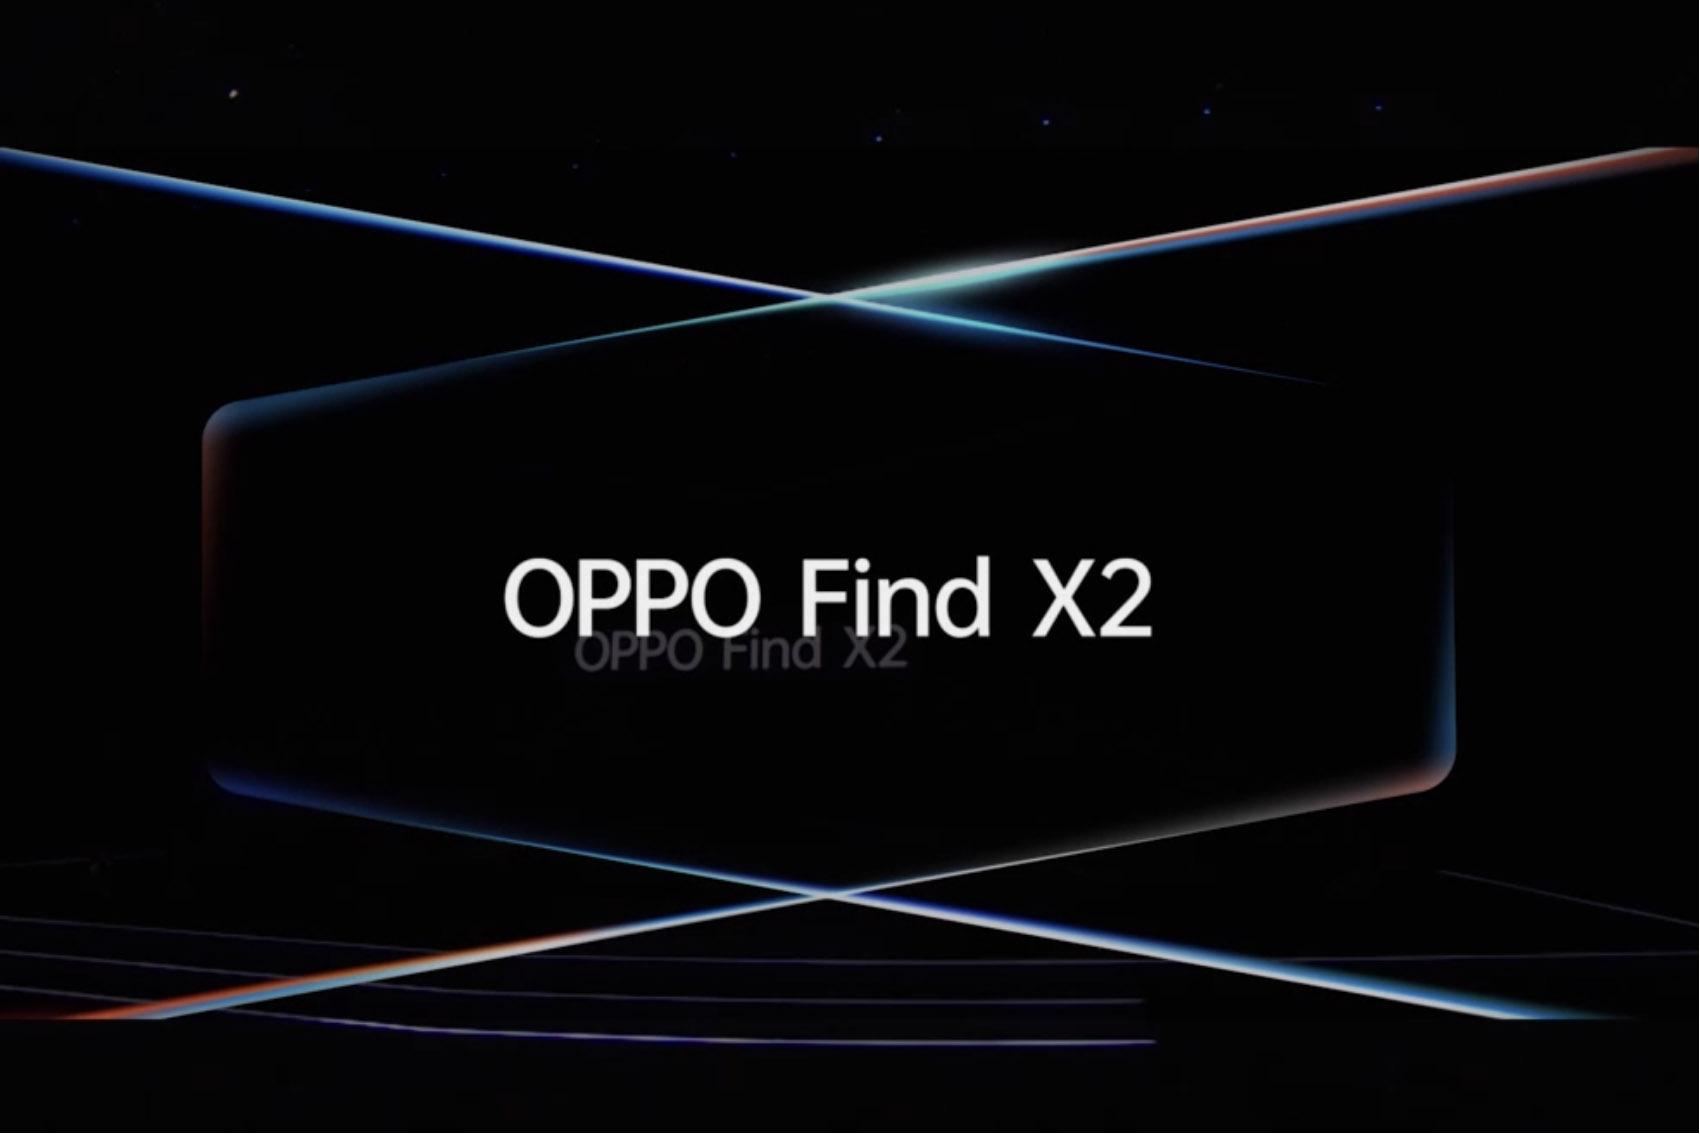 eWiseTech1 時隔兩年OPPO Find X2 攜OPPO Watch歸來